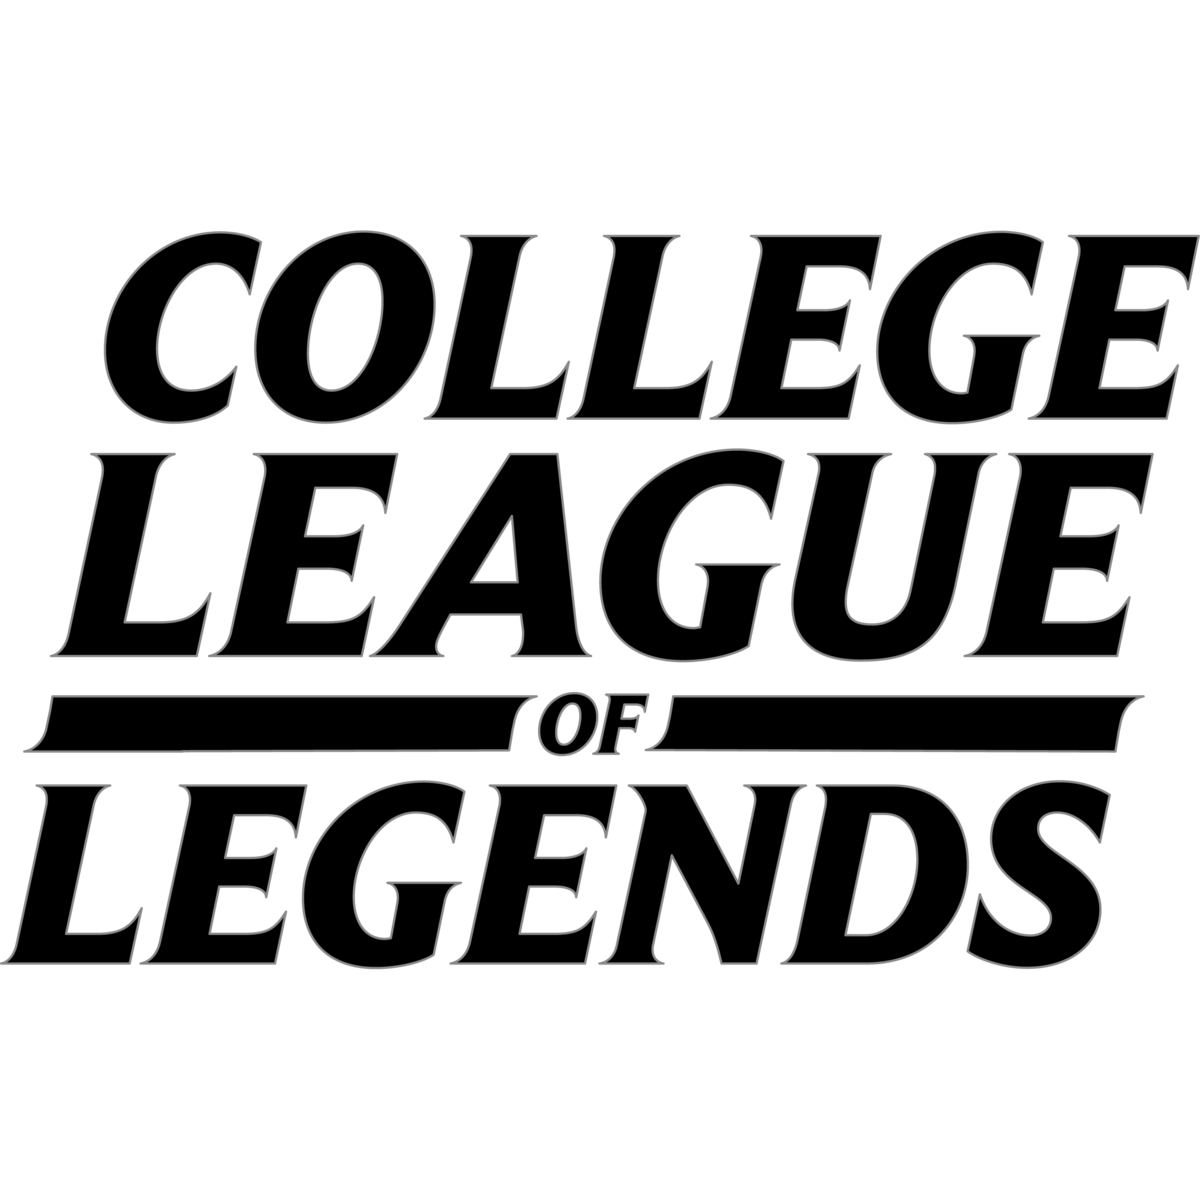 CLOL 2019 Championship - Leaguepedia | League of Legends Esports Wiki